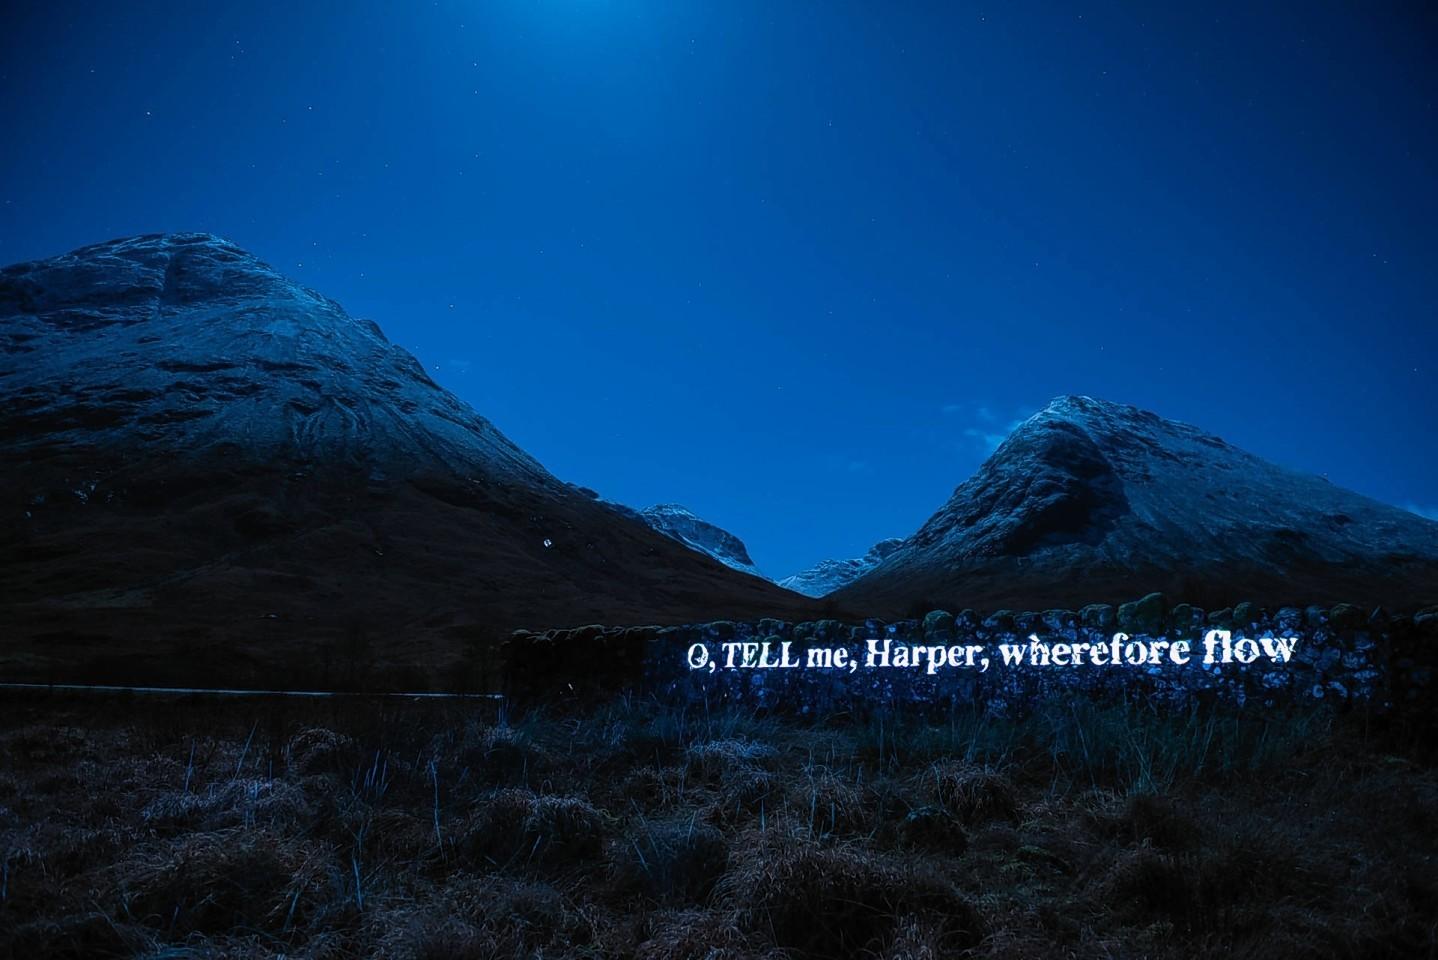 Sir Walter Scott poetry displayed on Glencoe mountains